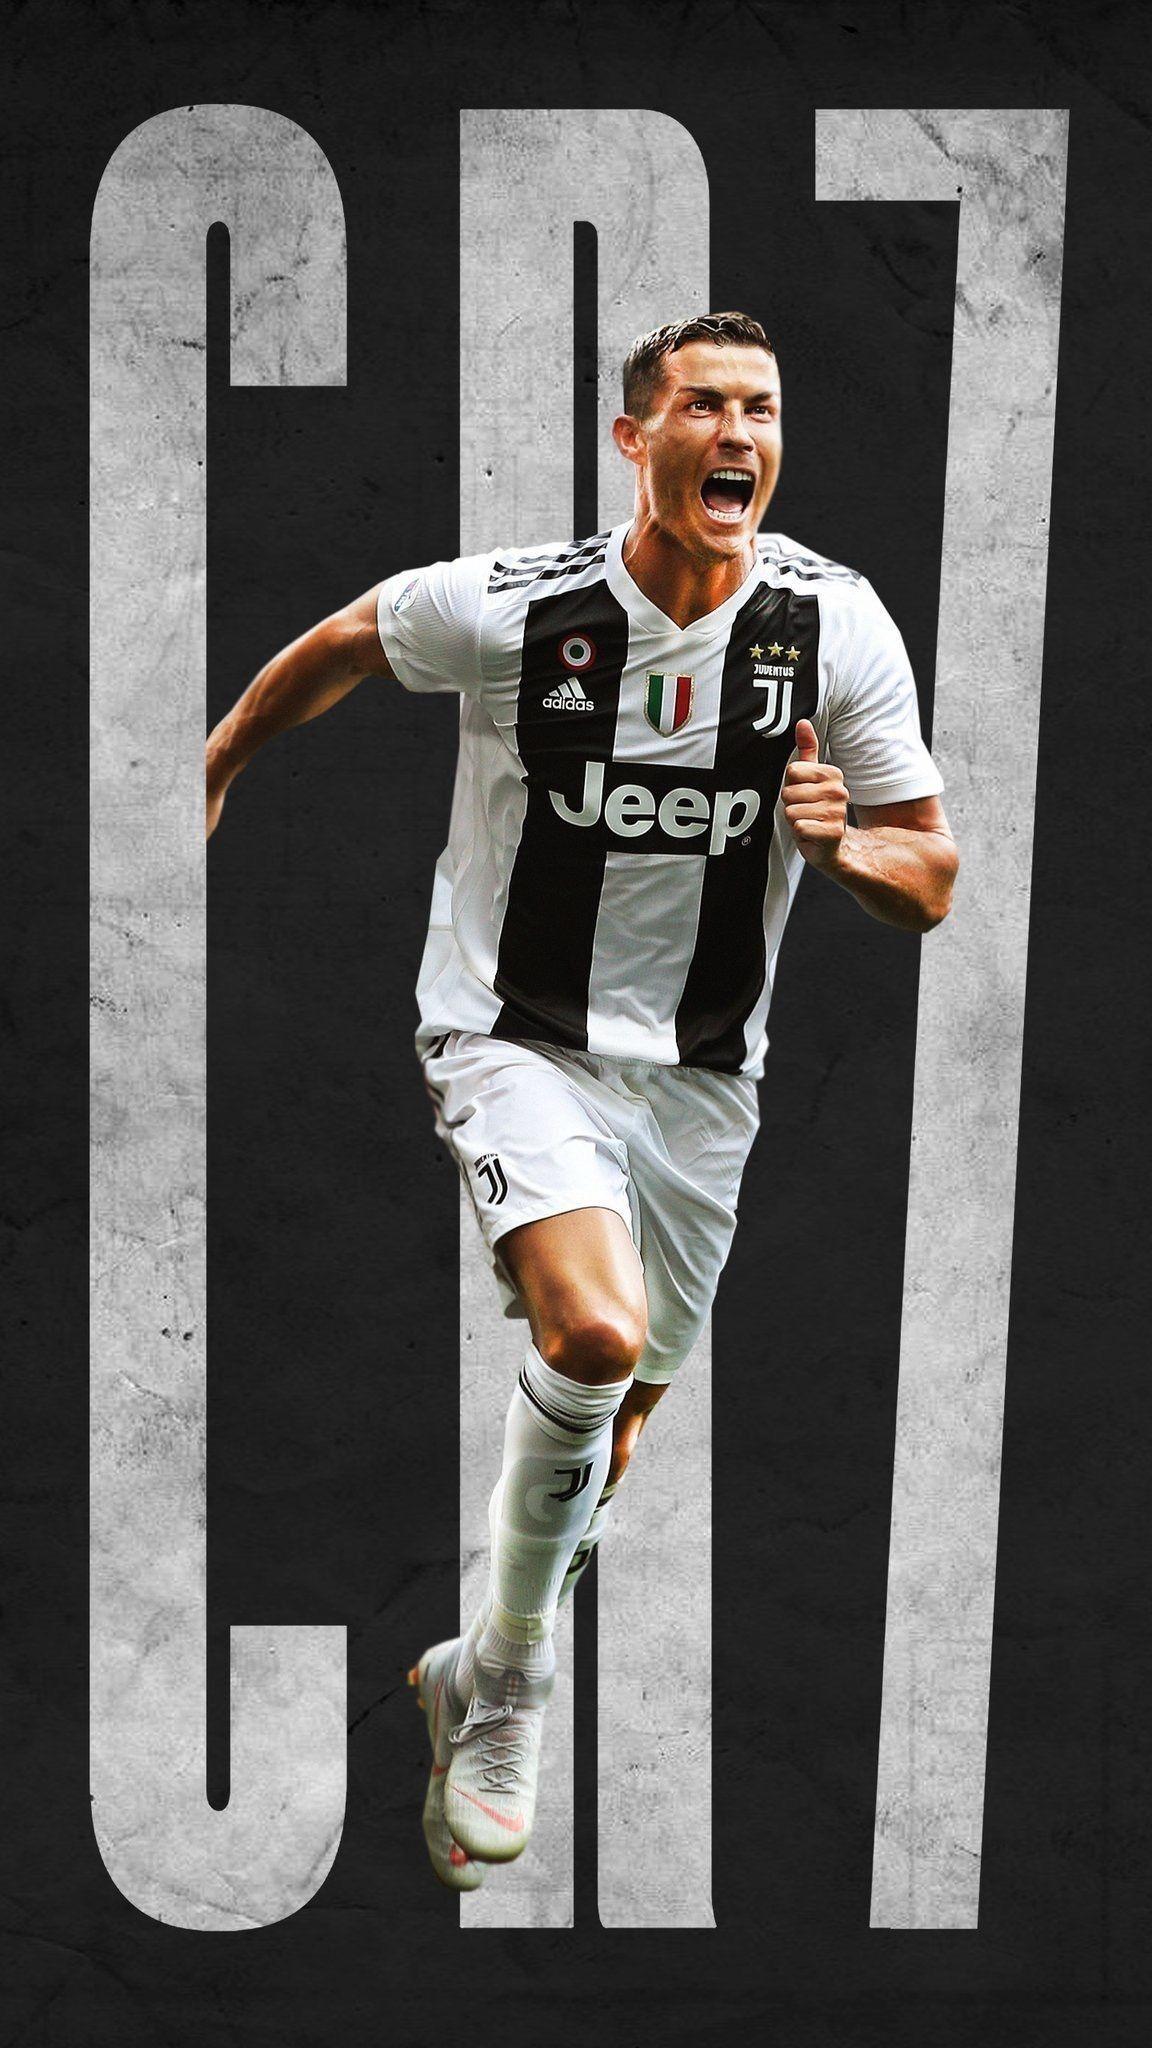 Ronaldo Wallpapers Photography Cristiano Ronaldo Celebrity Wallpaper Ronaldo Juventus Ronaldo Cristiano Ronaldo Juventus